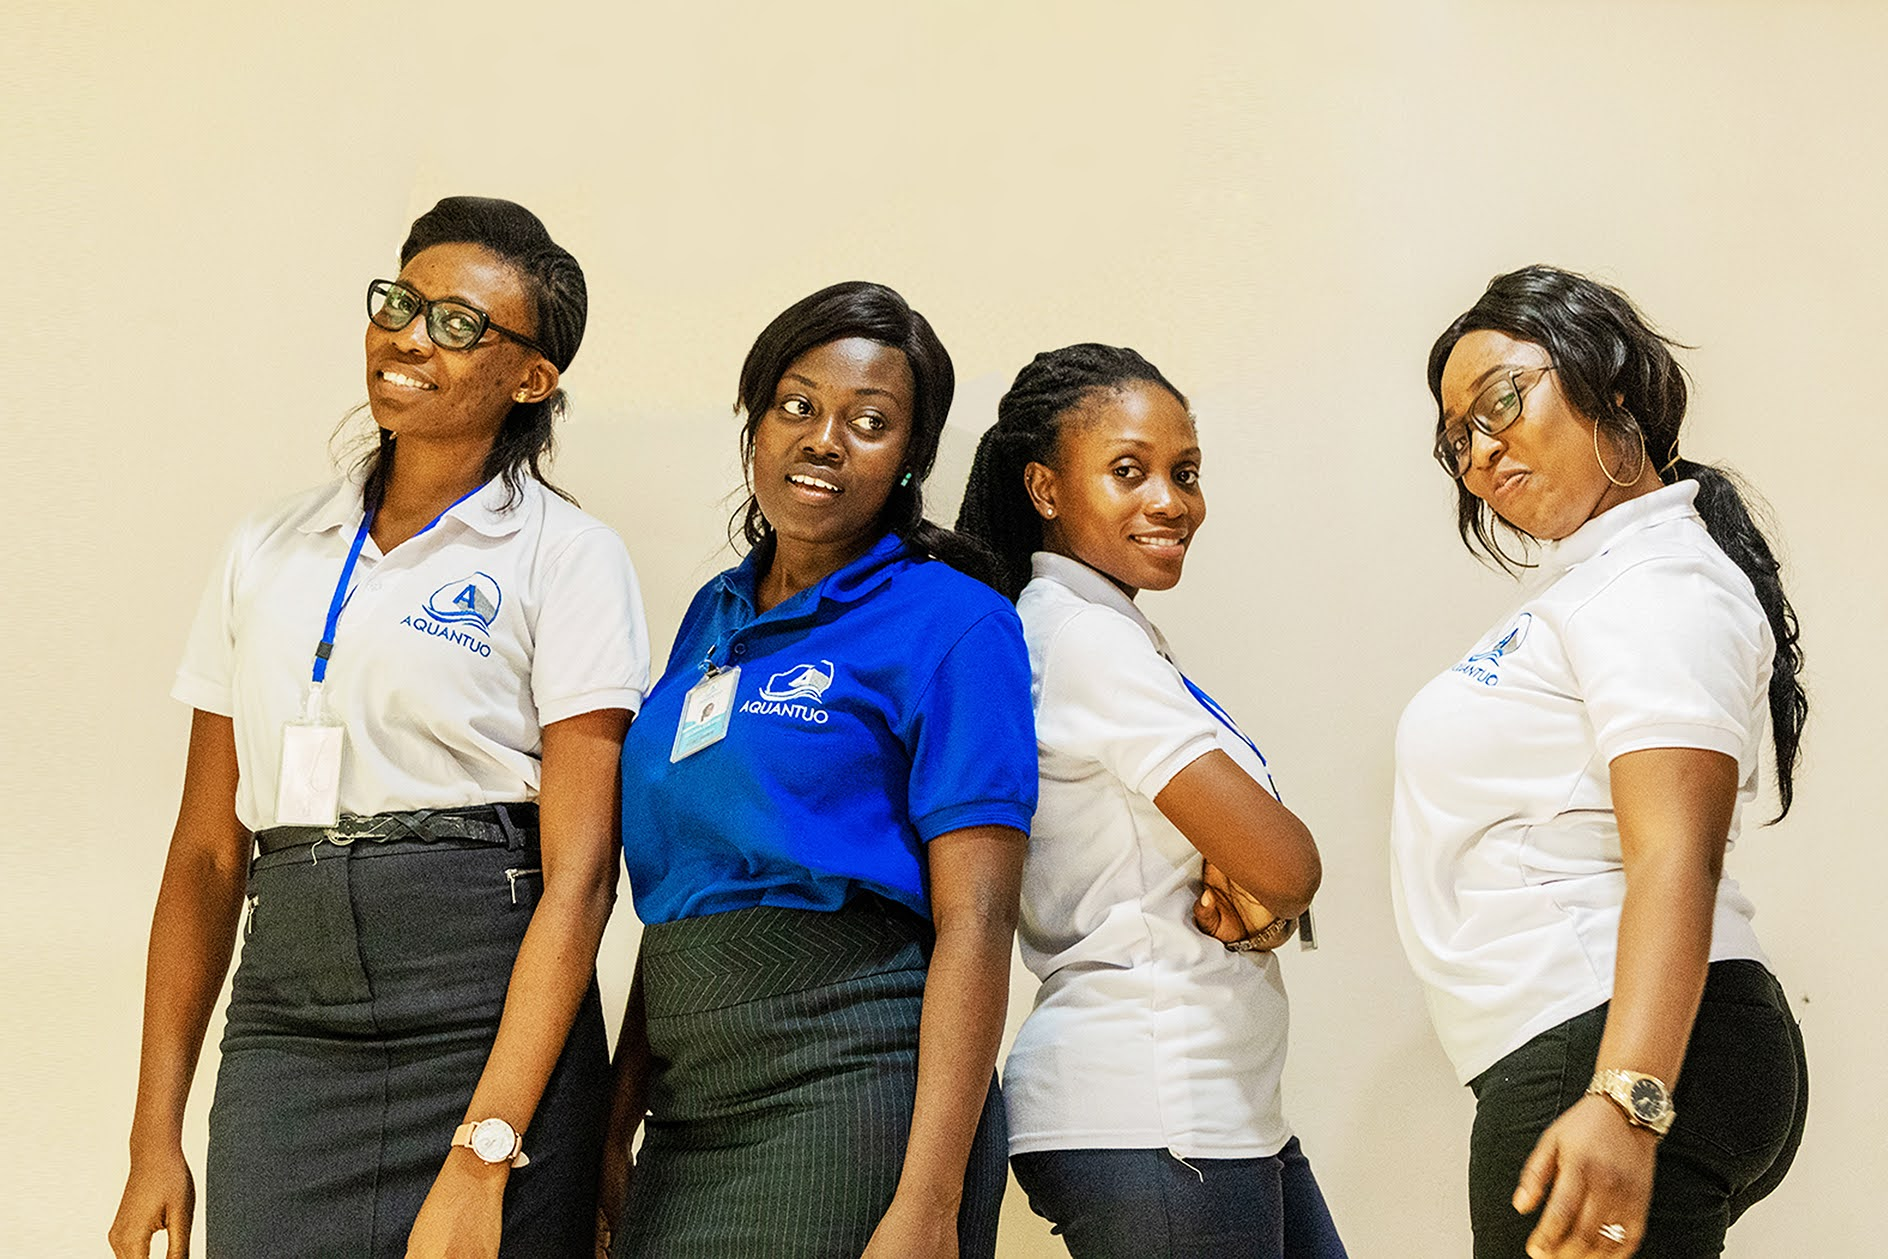 International shipping company team